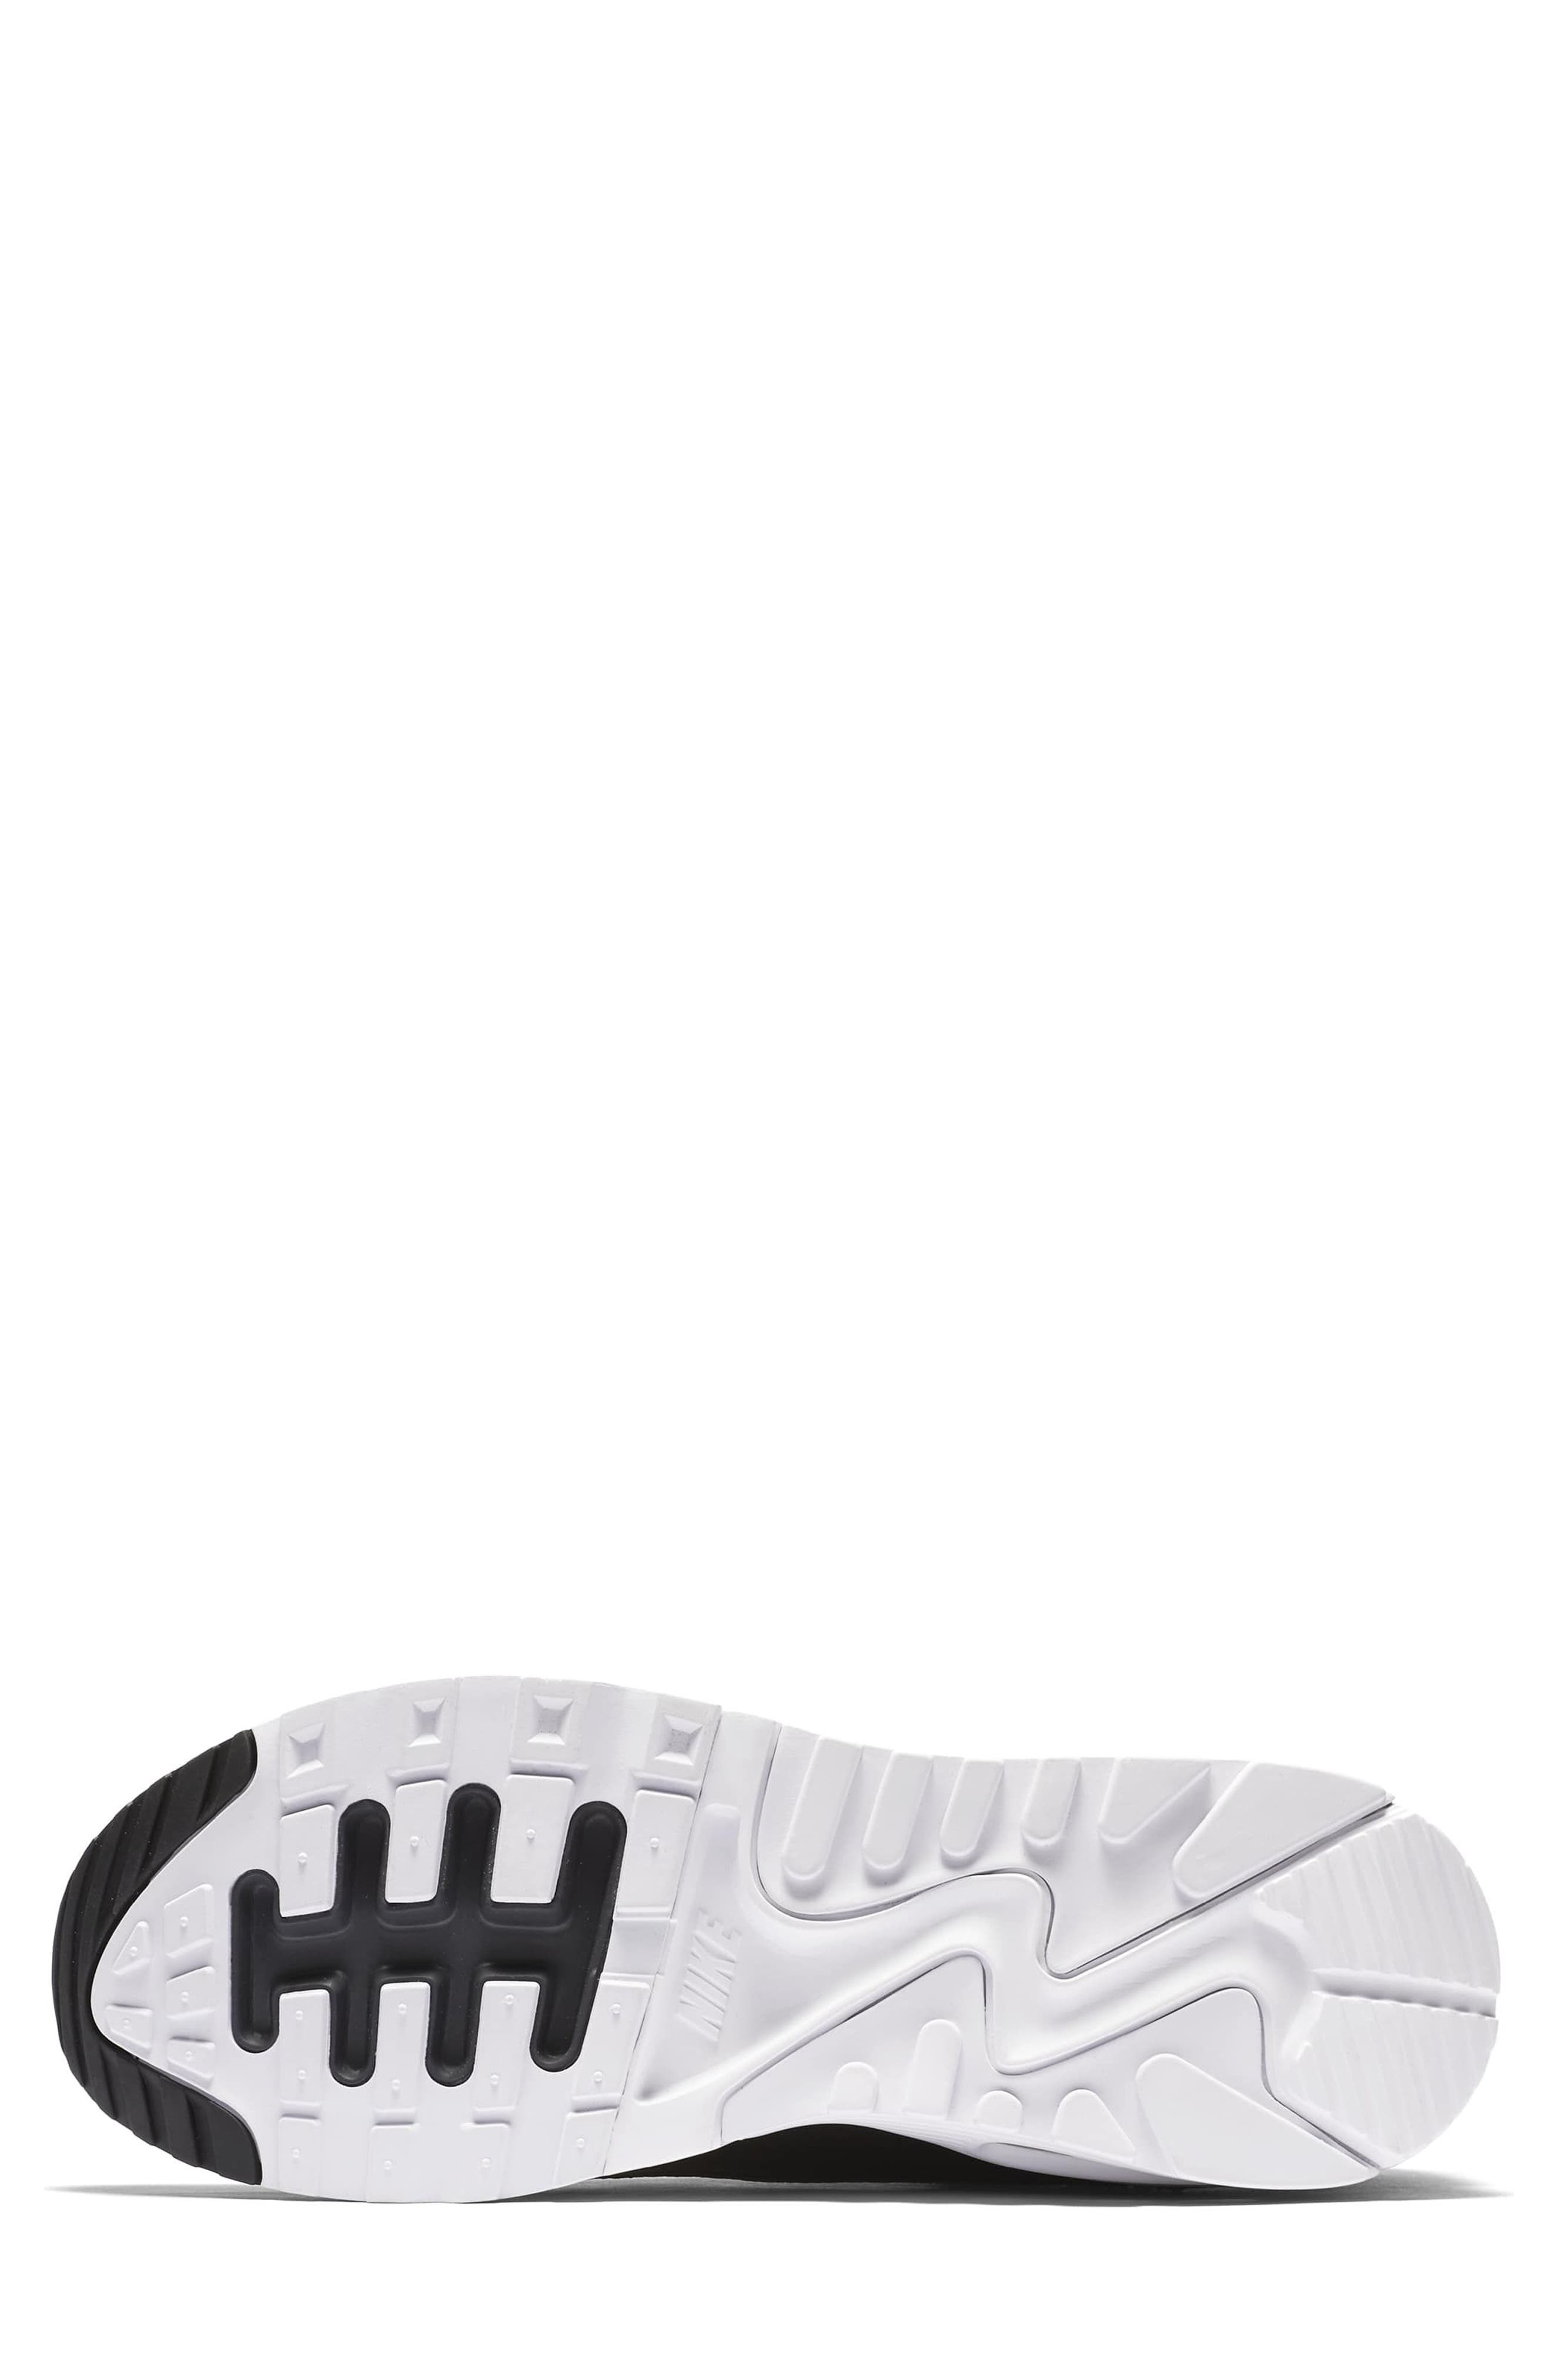 Air Max 90 Ultra 2.0 Sneaker,                             Alternate thumbnail 4, color,                             Black/ White/ Black